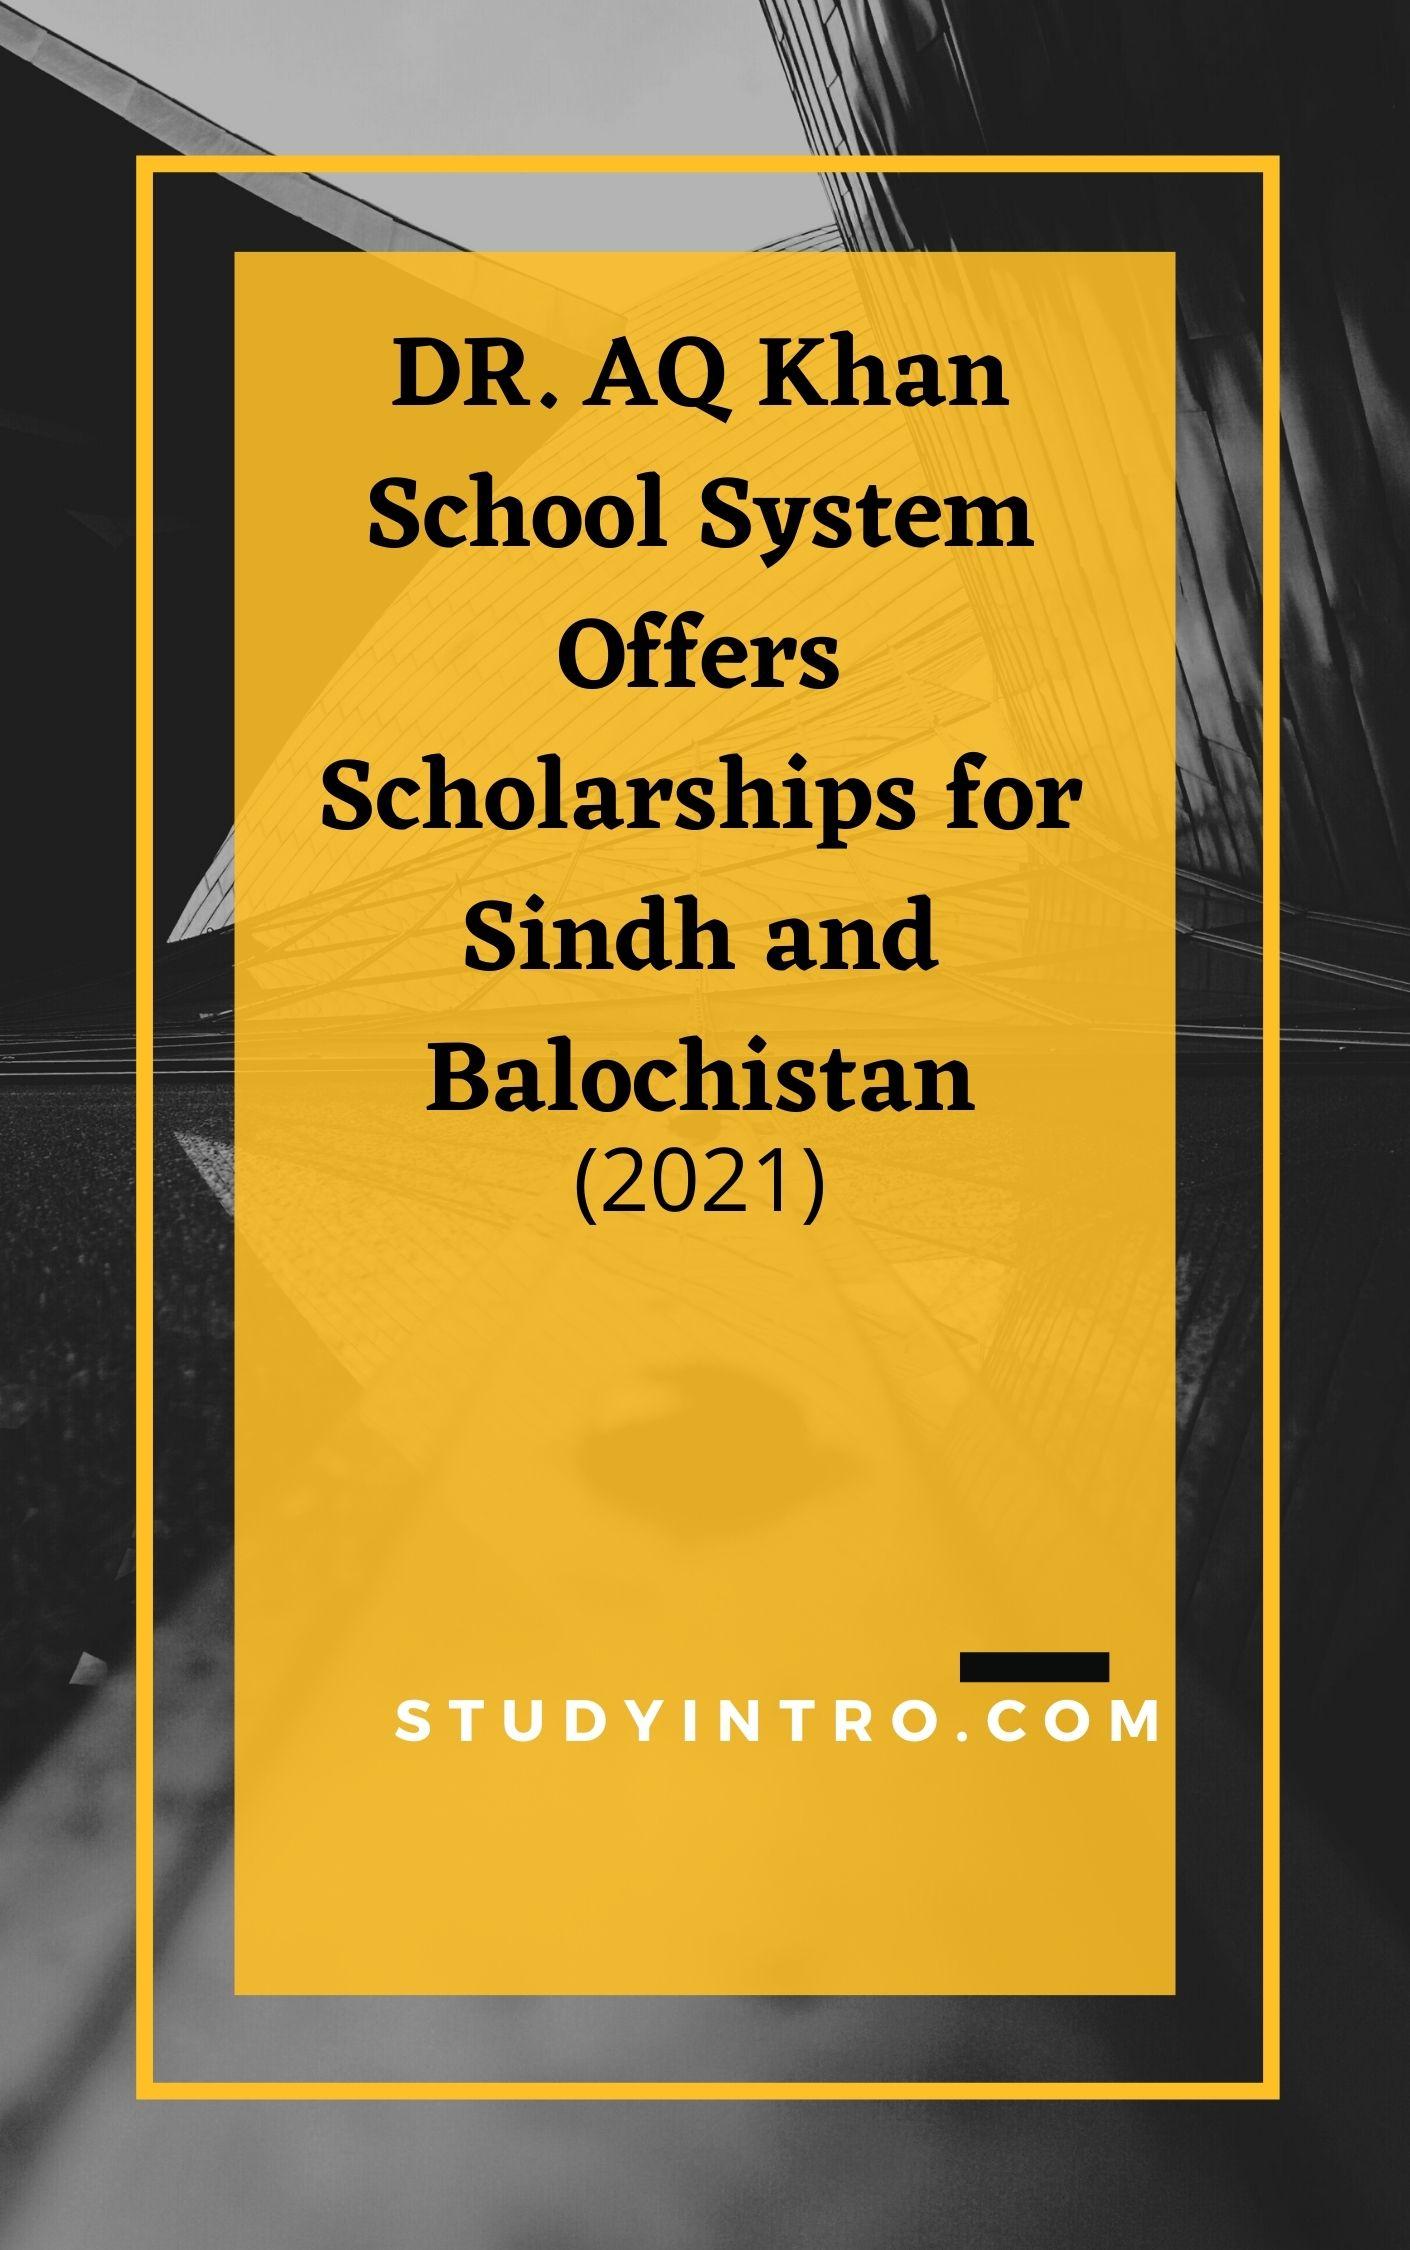 Dr. AQ Khan School offer Scholarships